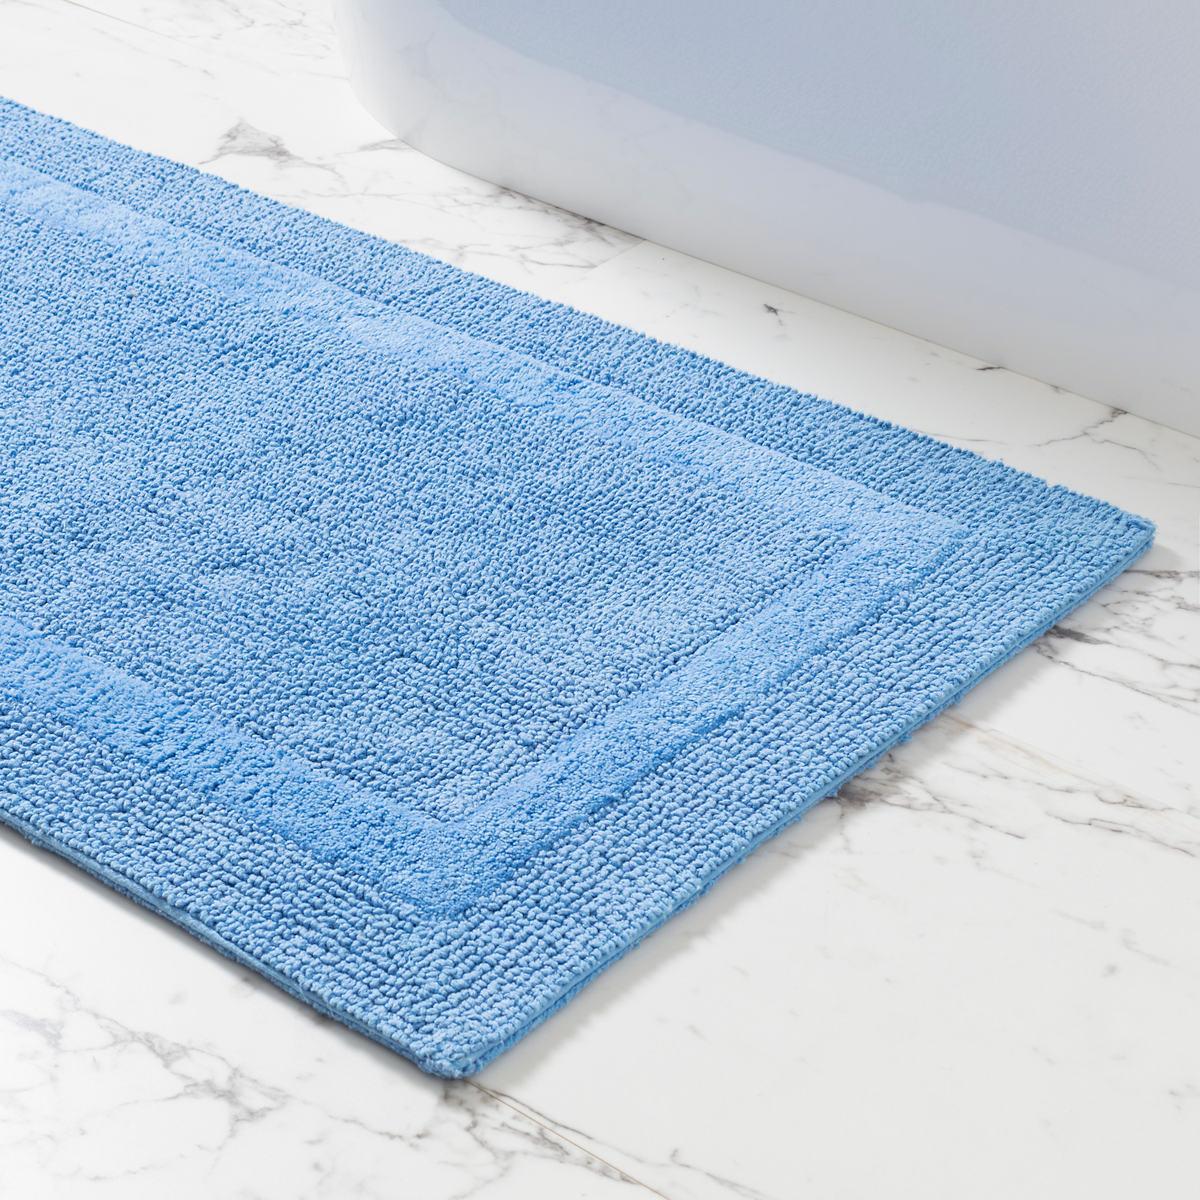 Signature French Blue Bath Rug